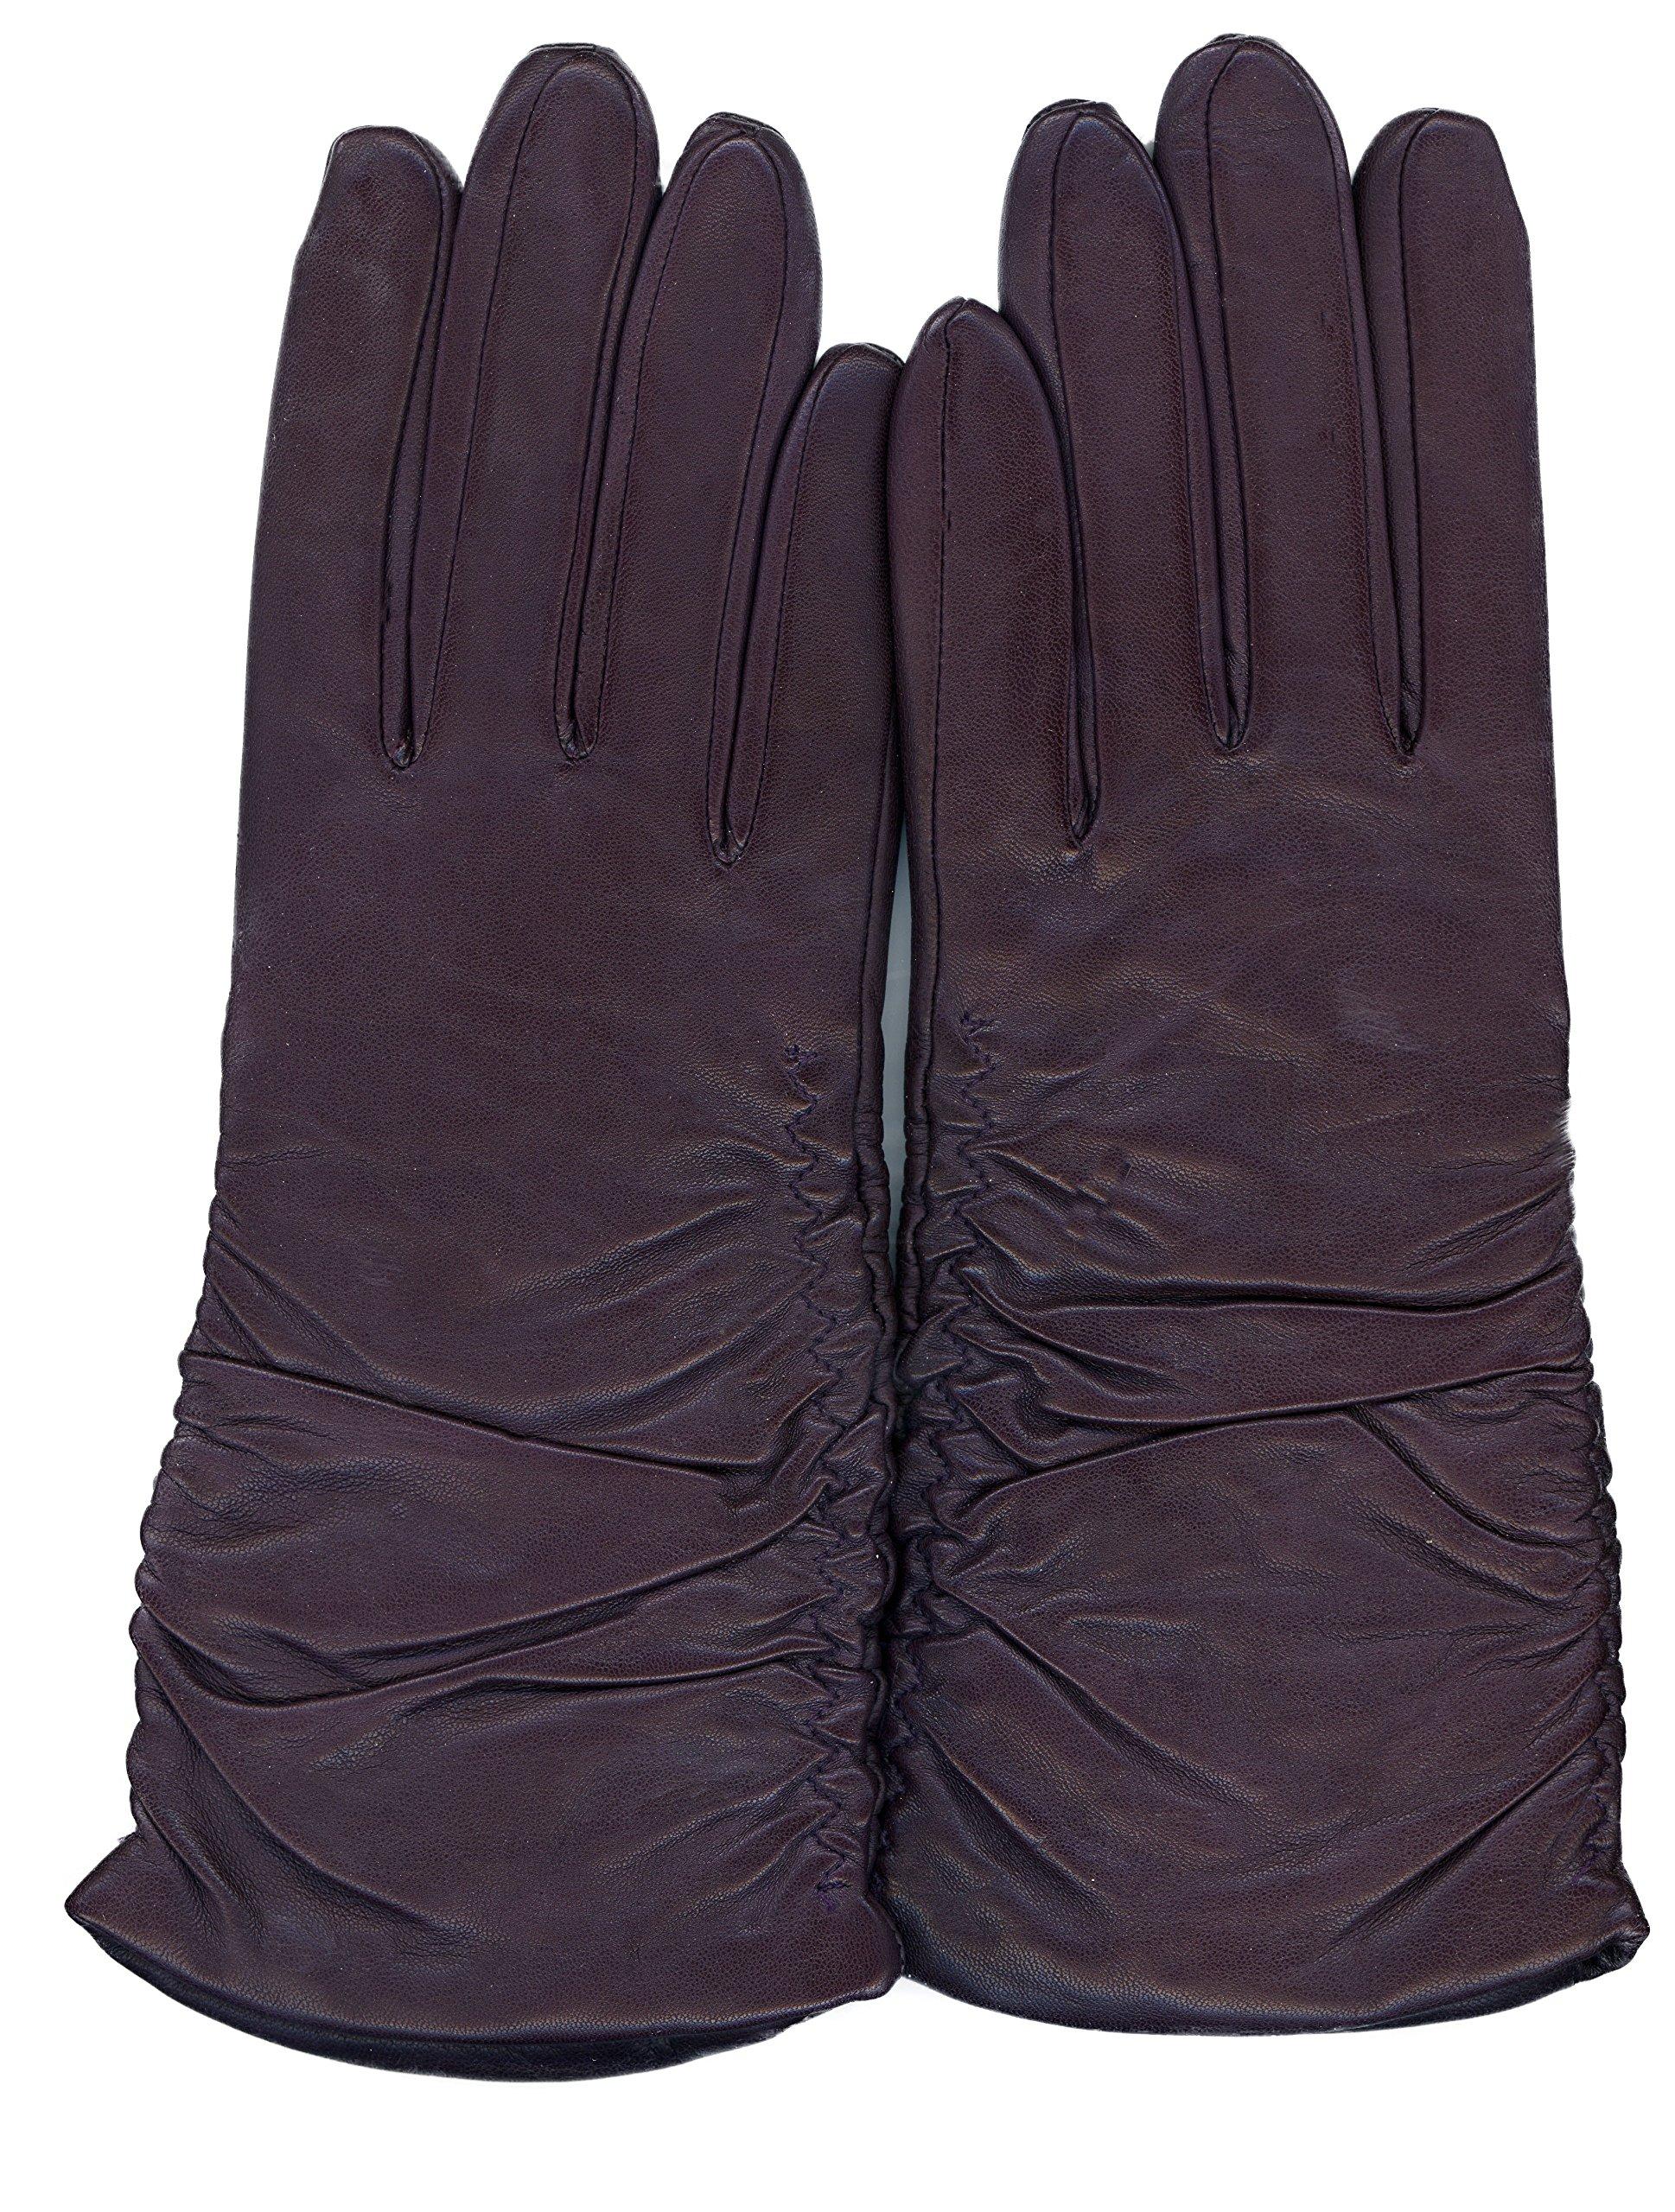 GRANDOE Women's PARIS Ruched Sheepskin Leather Glove Cashmere Blend 3 btn length (Plum, X-Large)